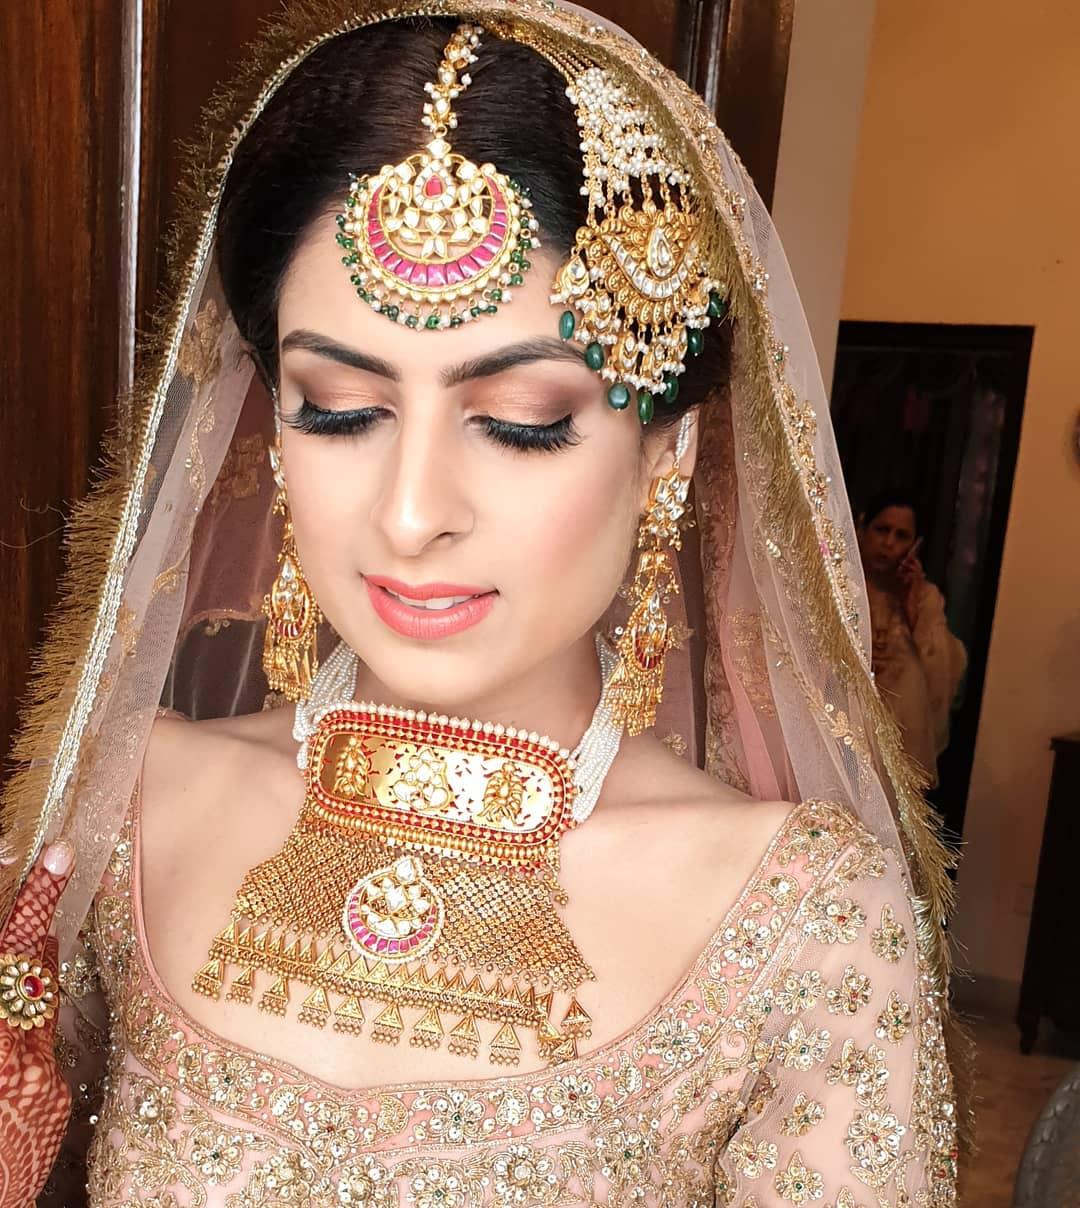 hasli haar | vintage jewellery | aardiya Bridal Necklace Designs | diamond necklaces for indian brides #wittyvows #indianbridaljewellery #bigfatindianwedding #rajasthanibride